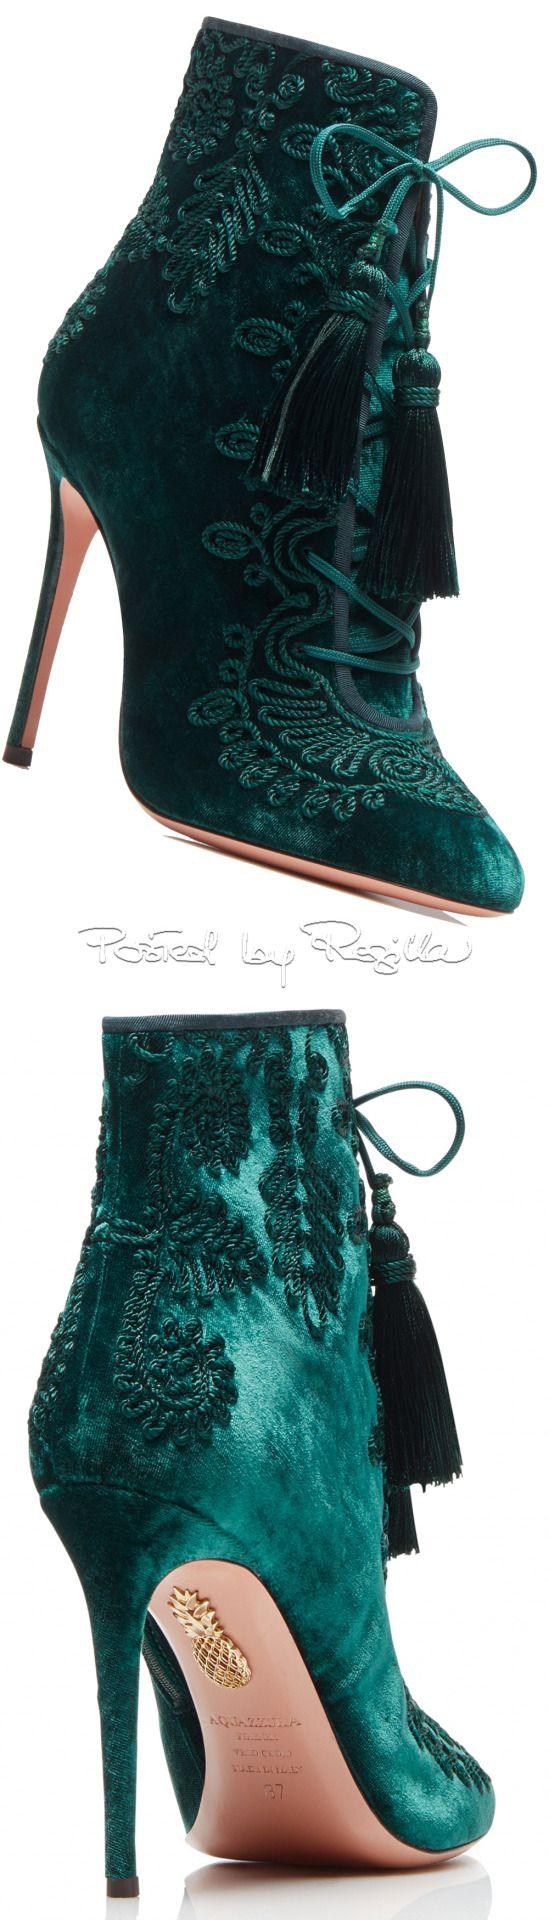 Green embroidered tassel high heel boots